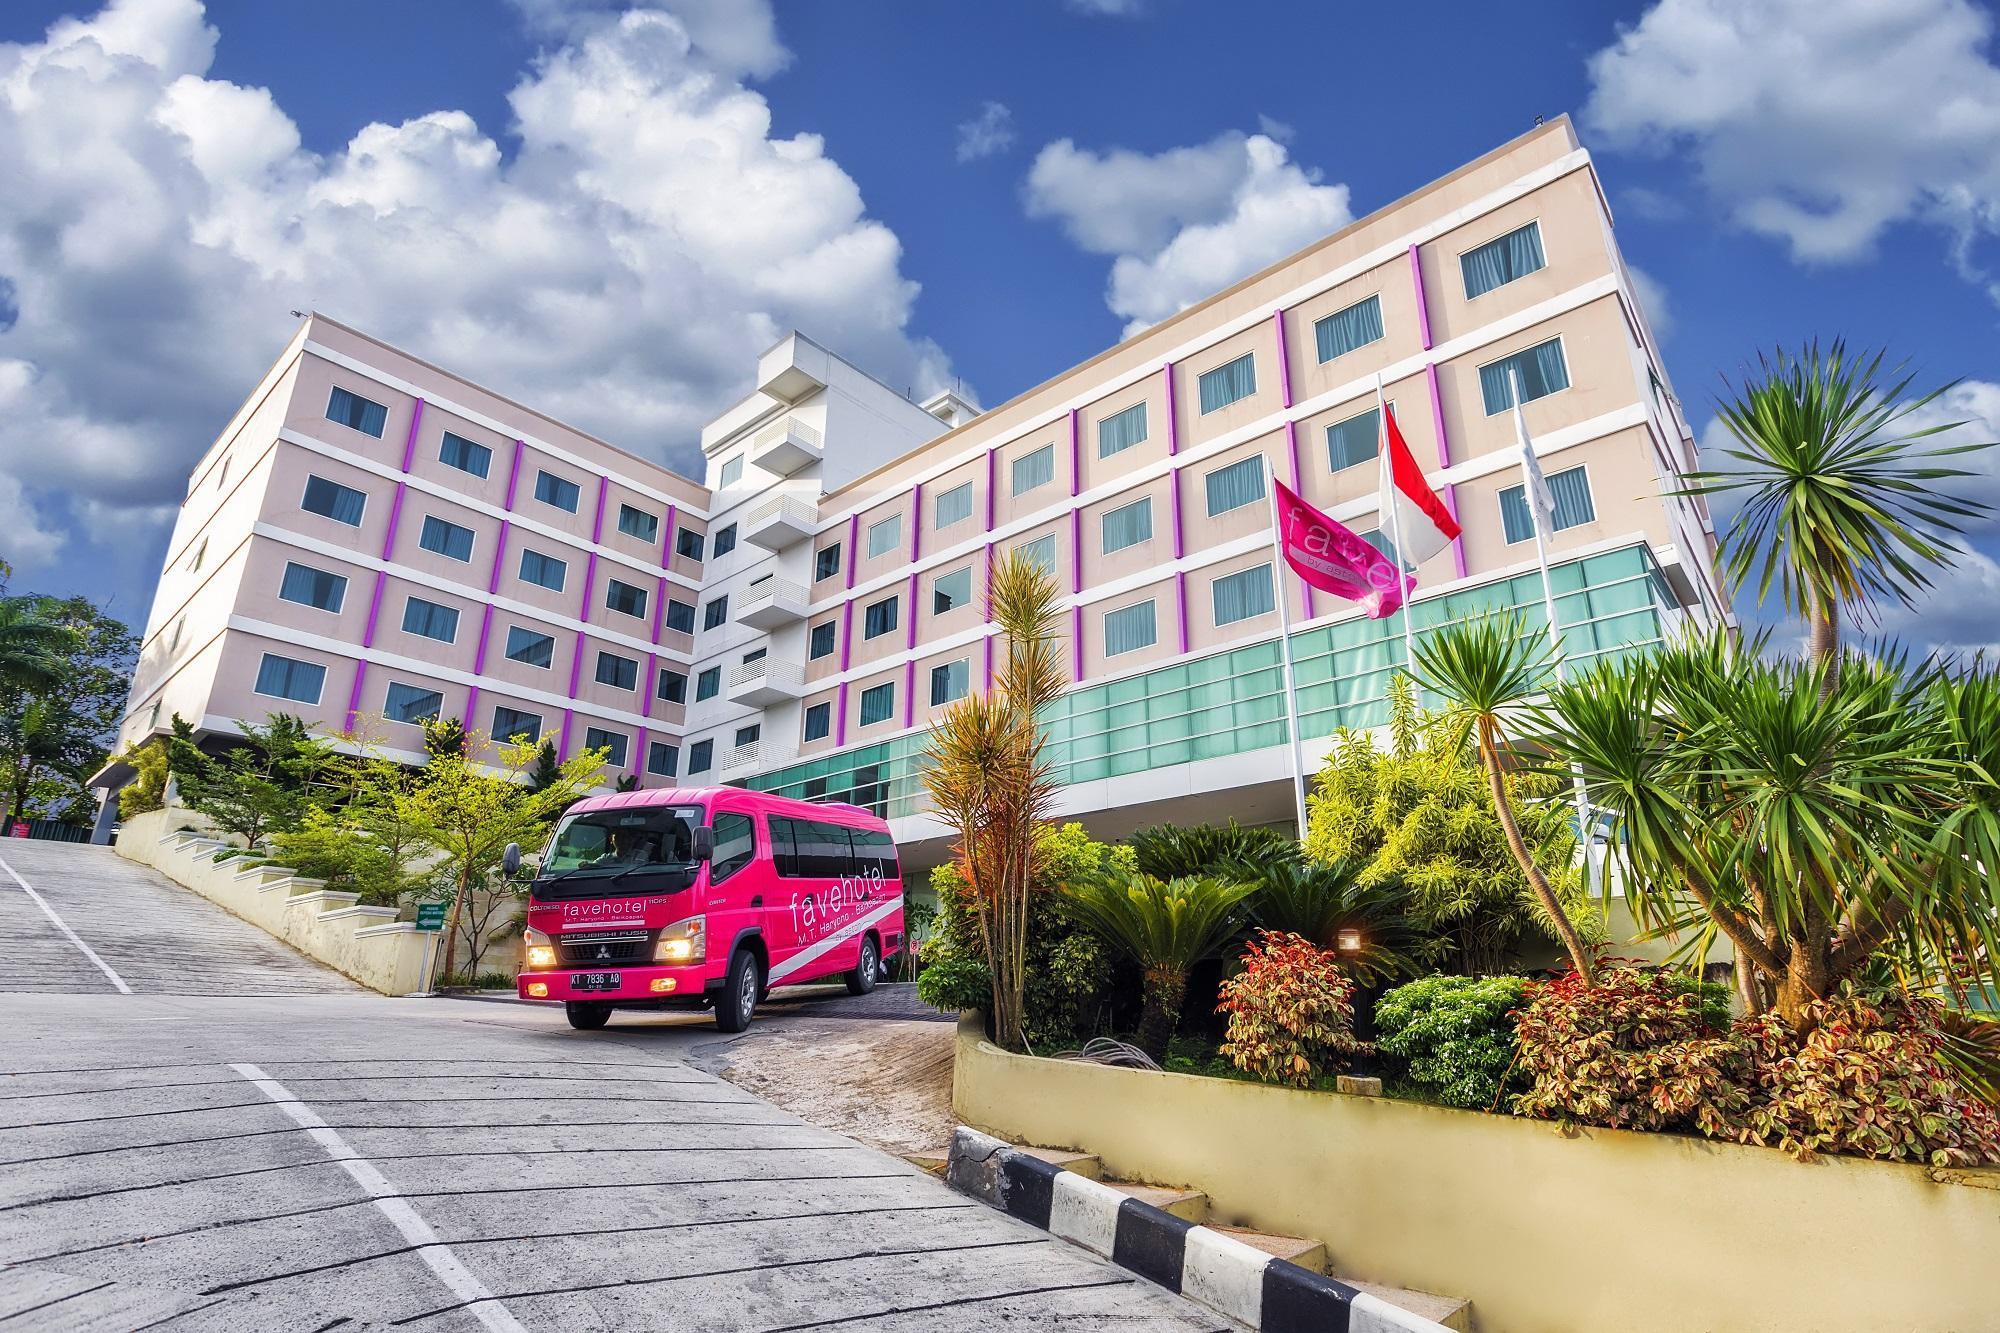 Favehotel MT. Haryono - Balikpapan Balikpapan Indonesia